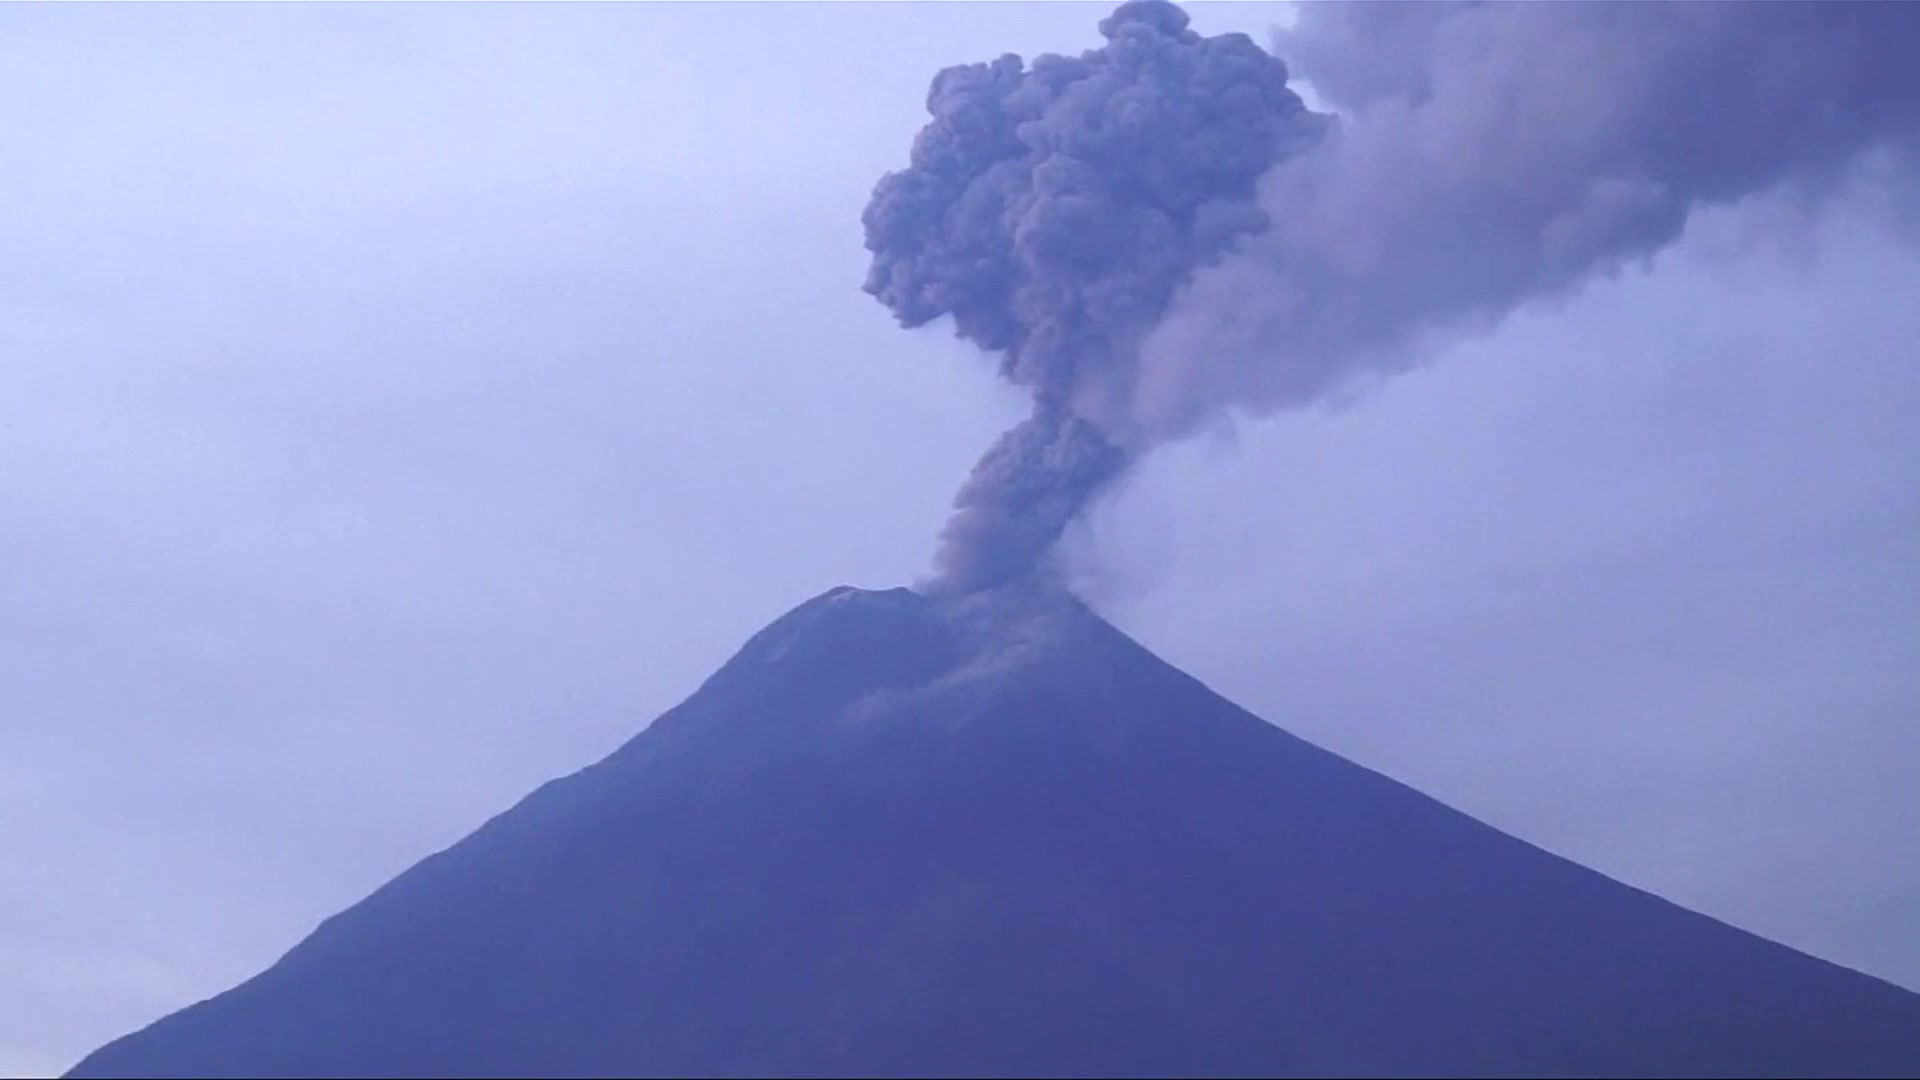 Ecuador's Tungurahua Volcano Explodes